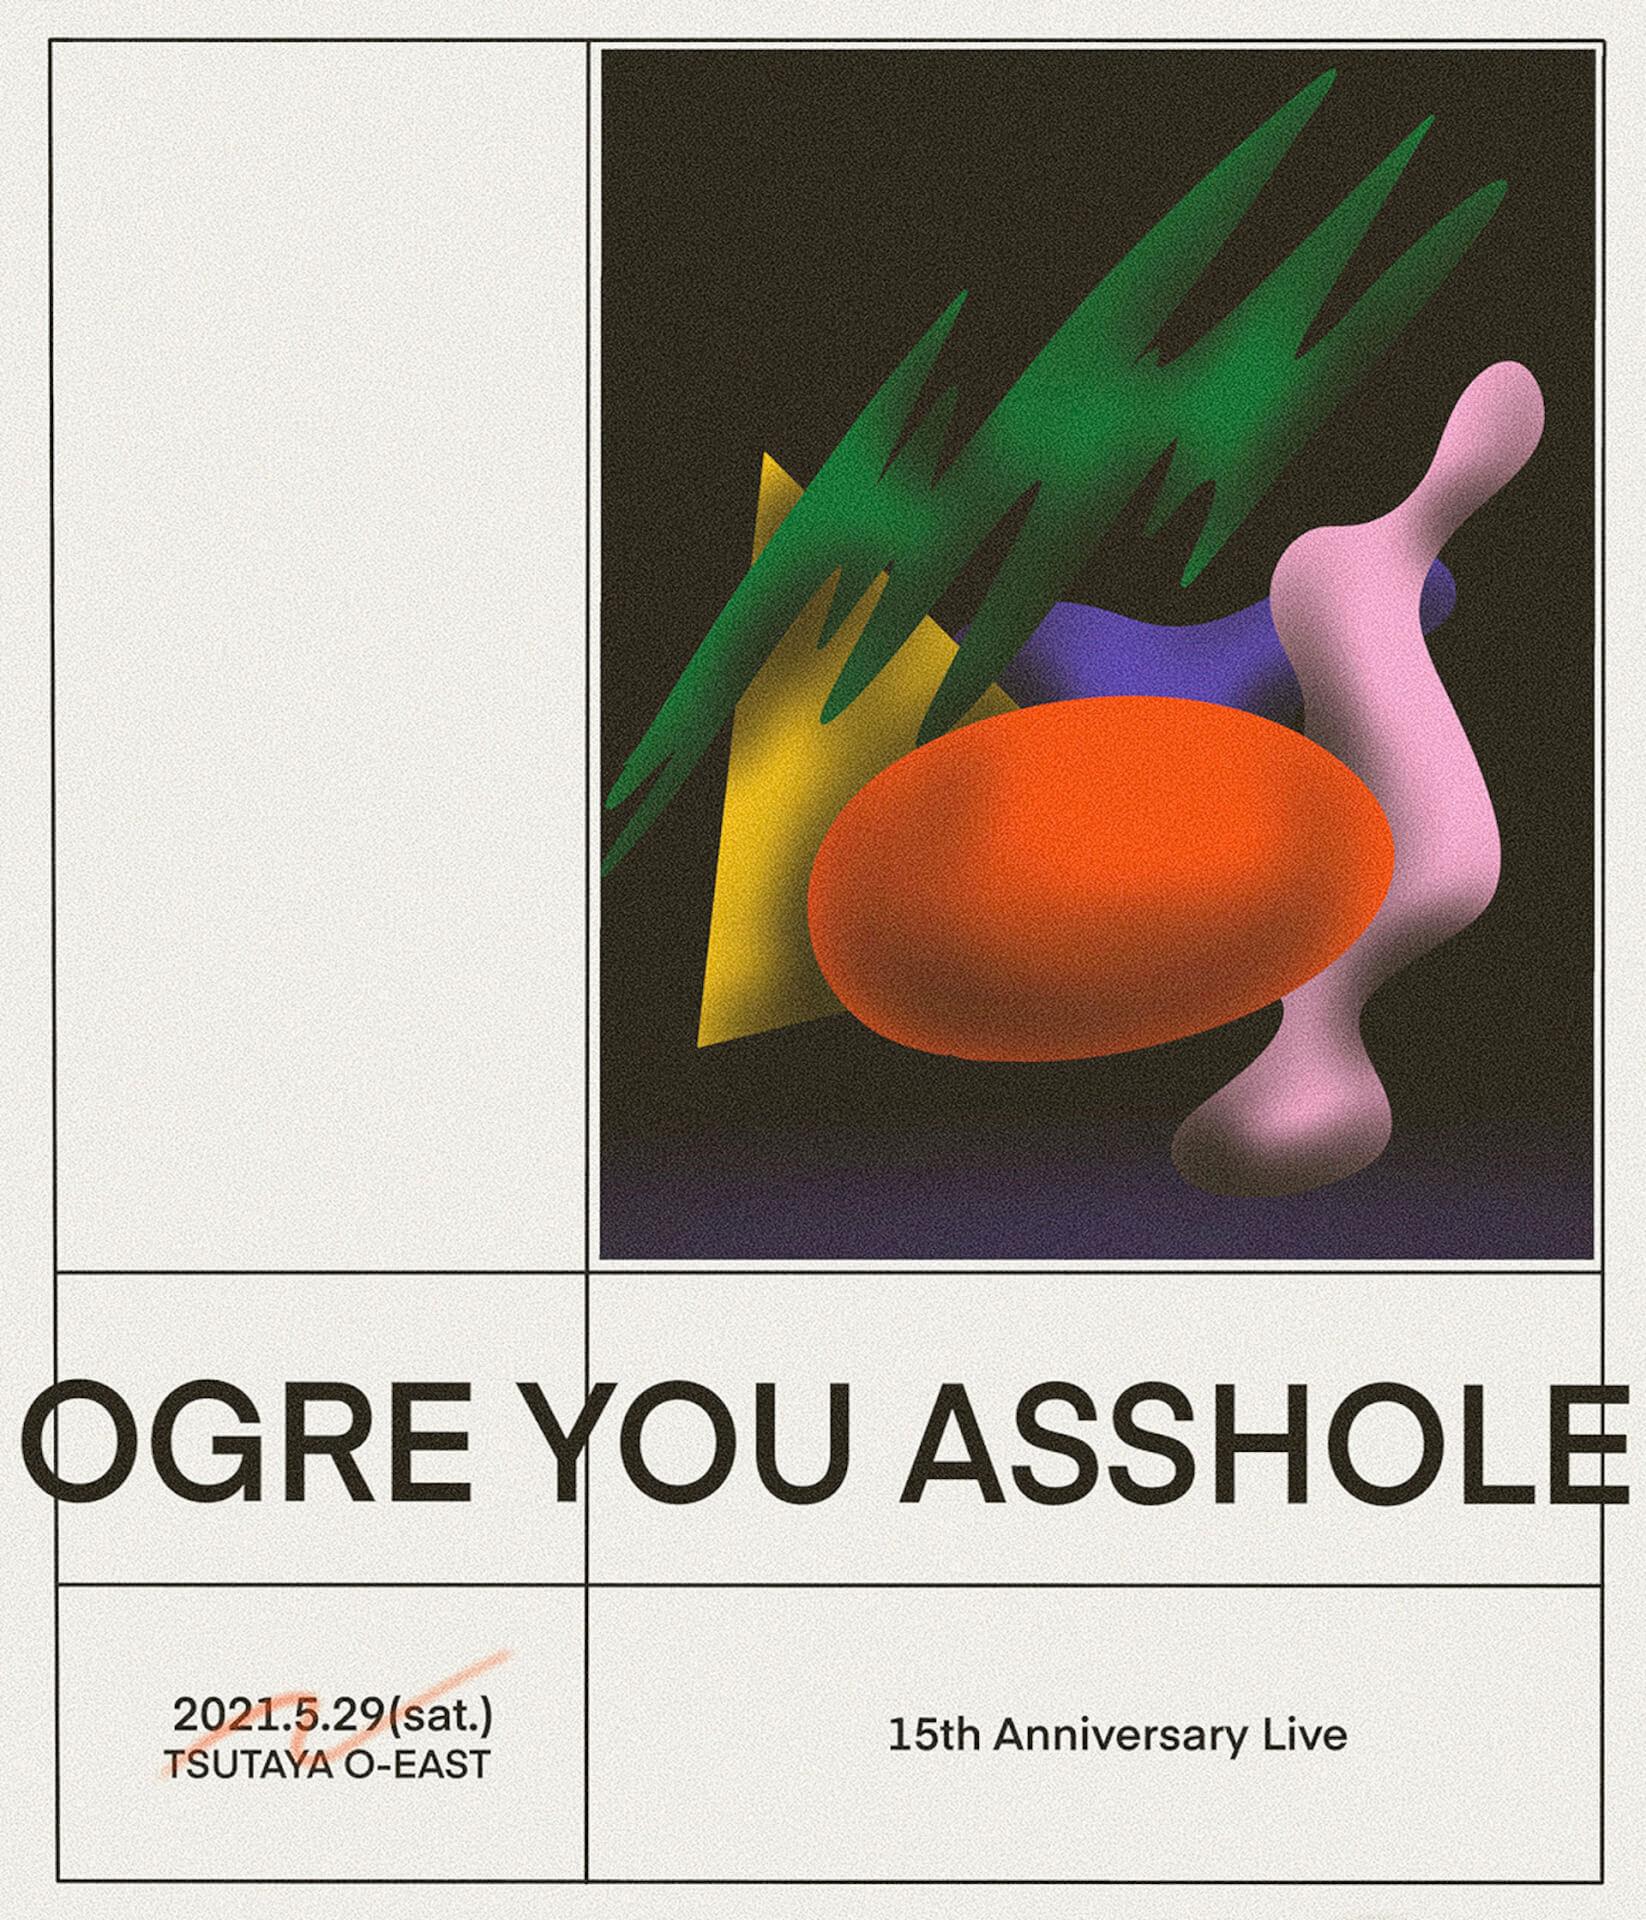 OGRE YOU ASSHOLEの15周年ワンマンライブがLIVEWIREで生配信決定!ミニアルバム『平均は左右逆の期待』がストリーミング解禁 music210426_ogreyouasshole_1